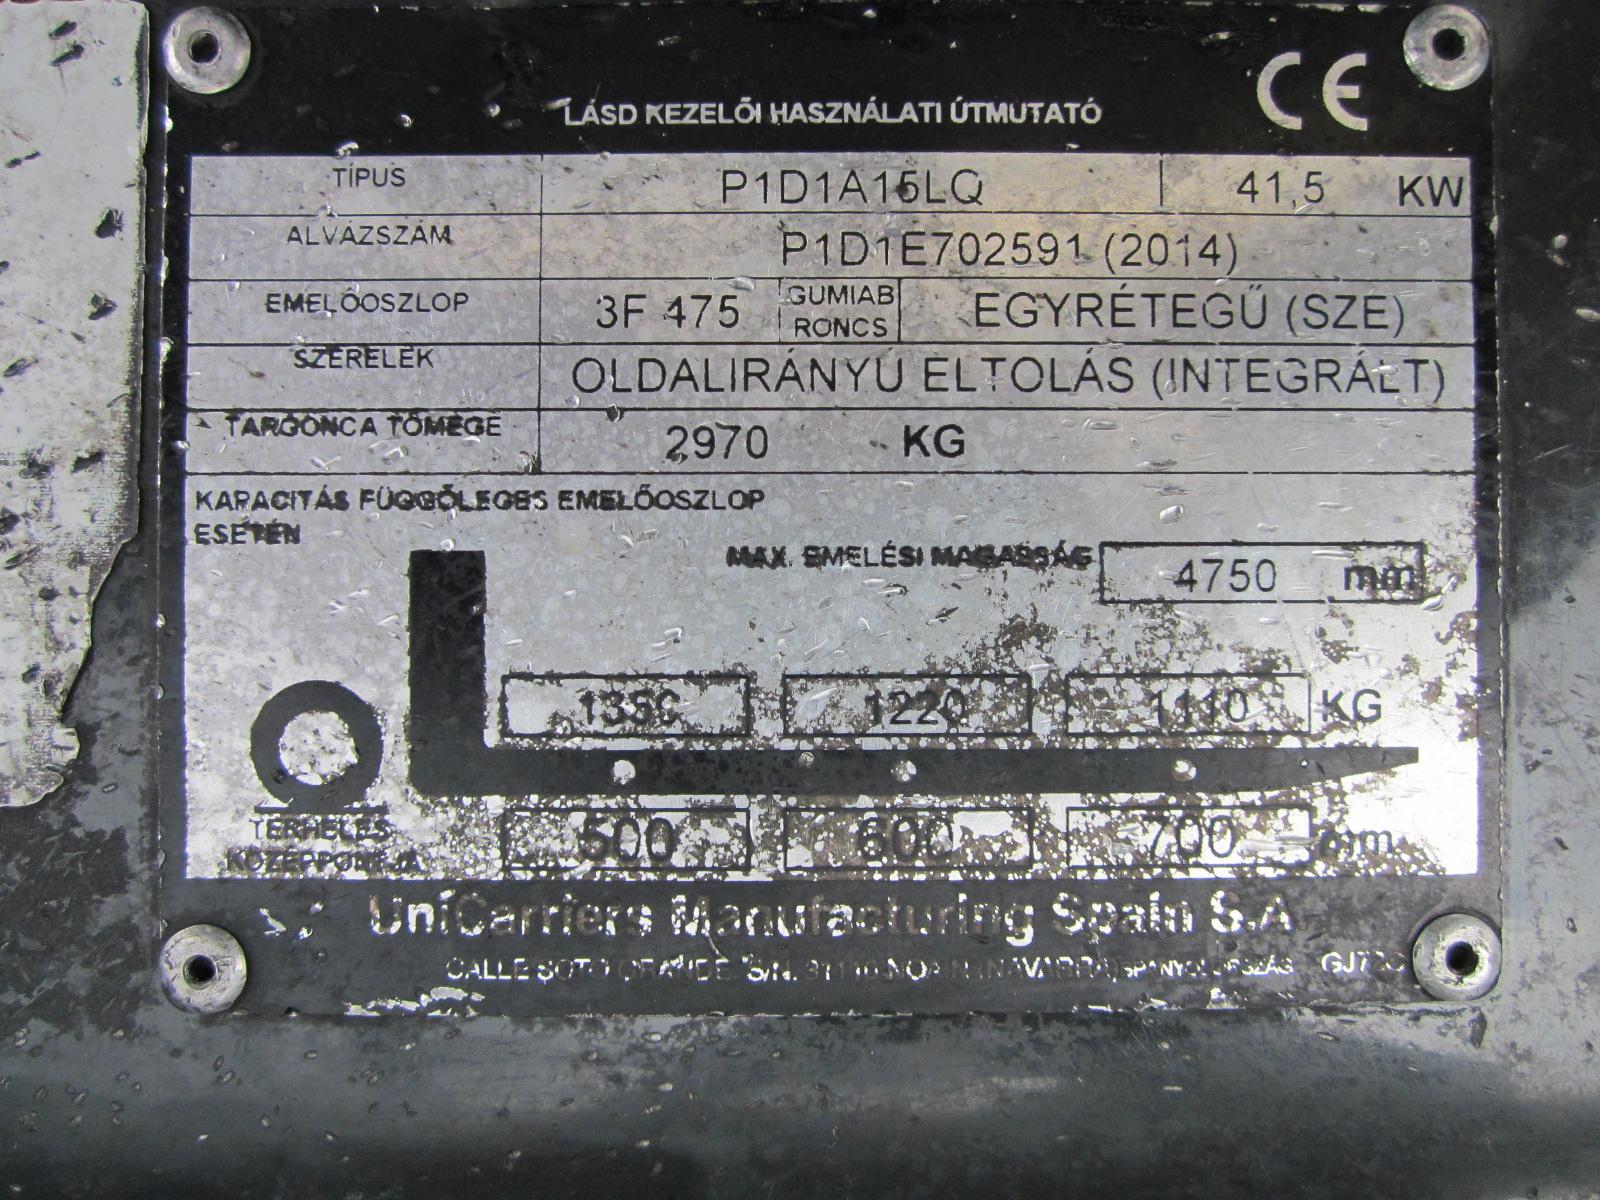 Nissan DX15LPG PG154729 targonca3